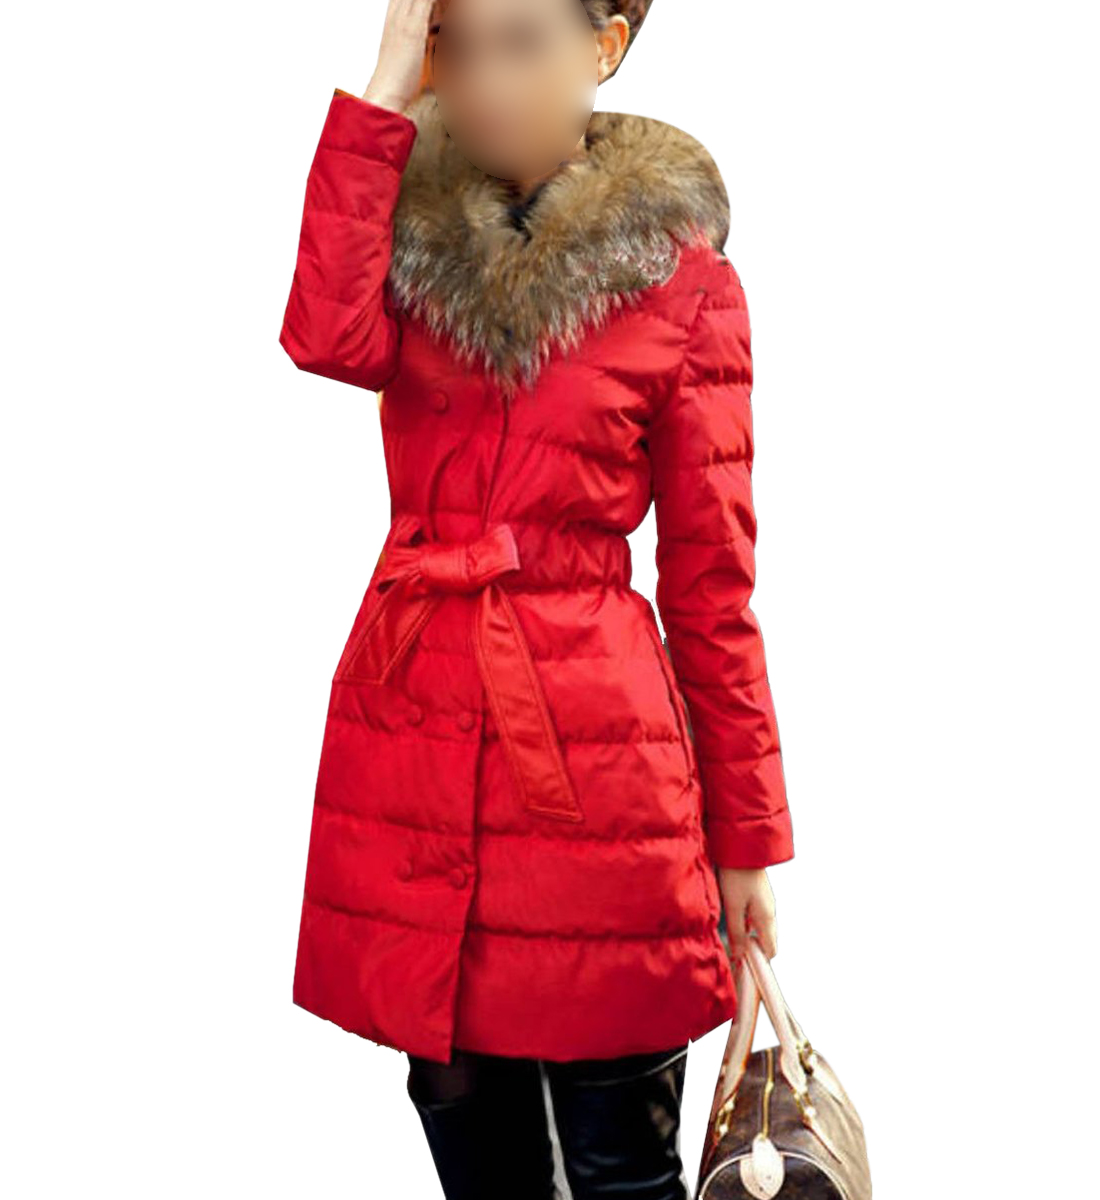 Fashion Women Winter Long down cotton trench coat double Breasted padded jacket belt fur Size S-XXL Red Black ellen tracy outerwear women s double breasted classic trench coat